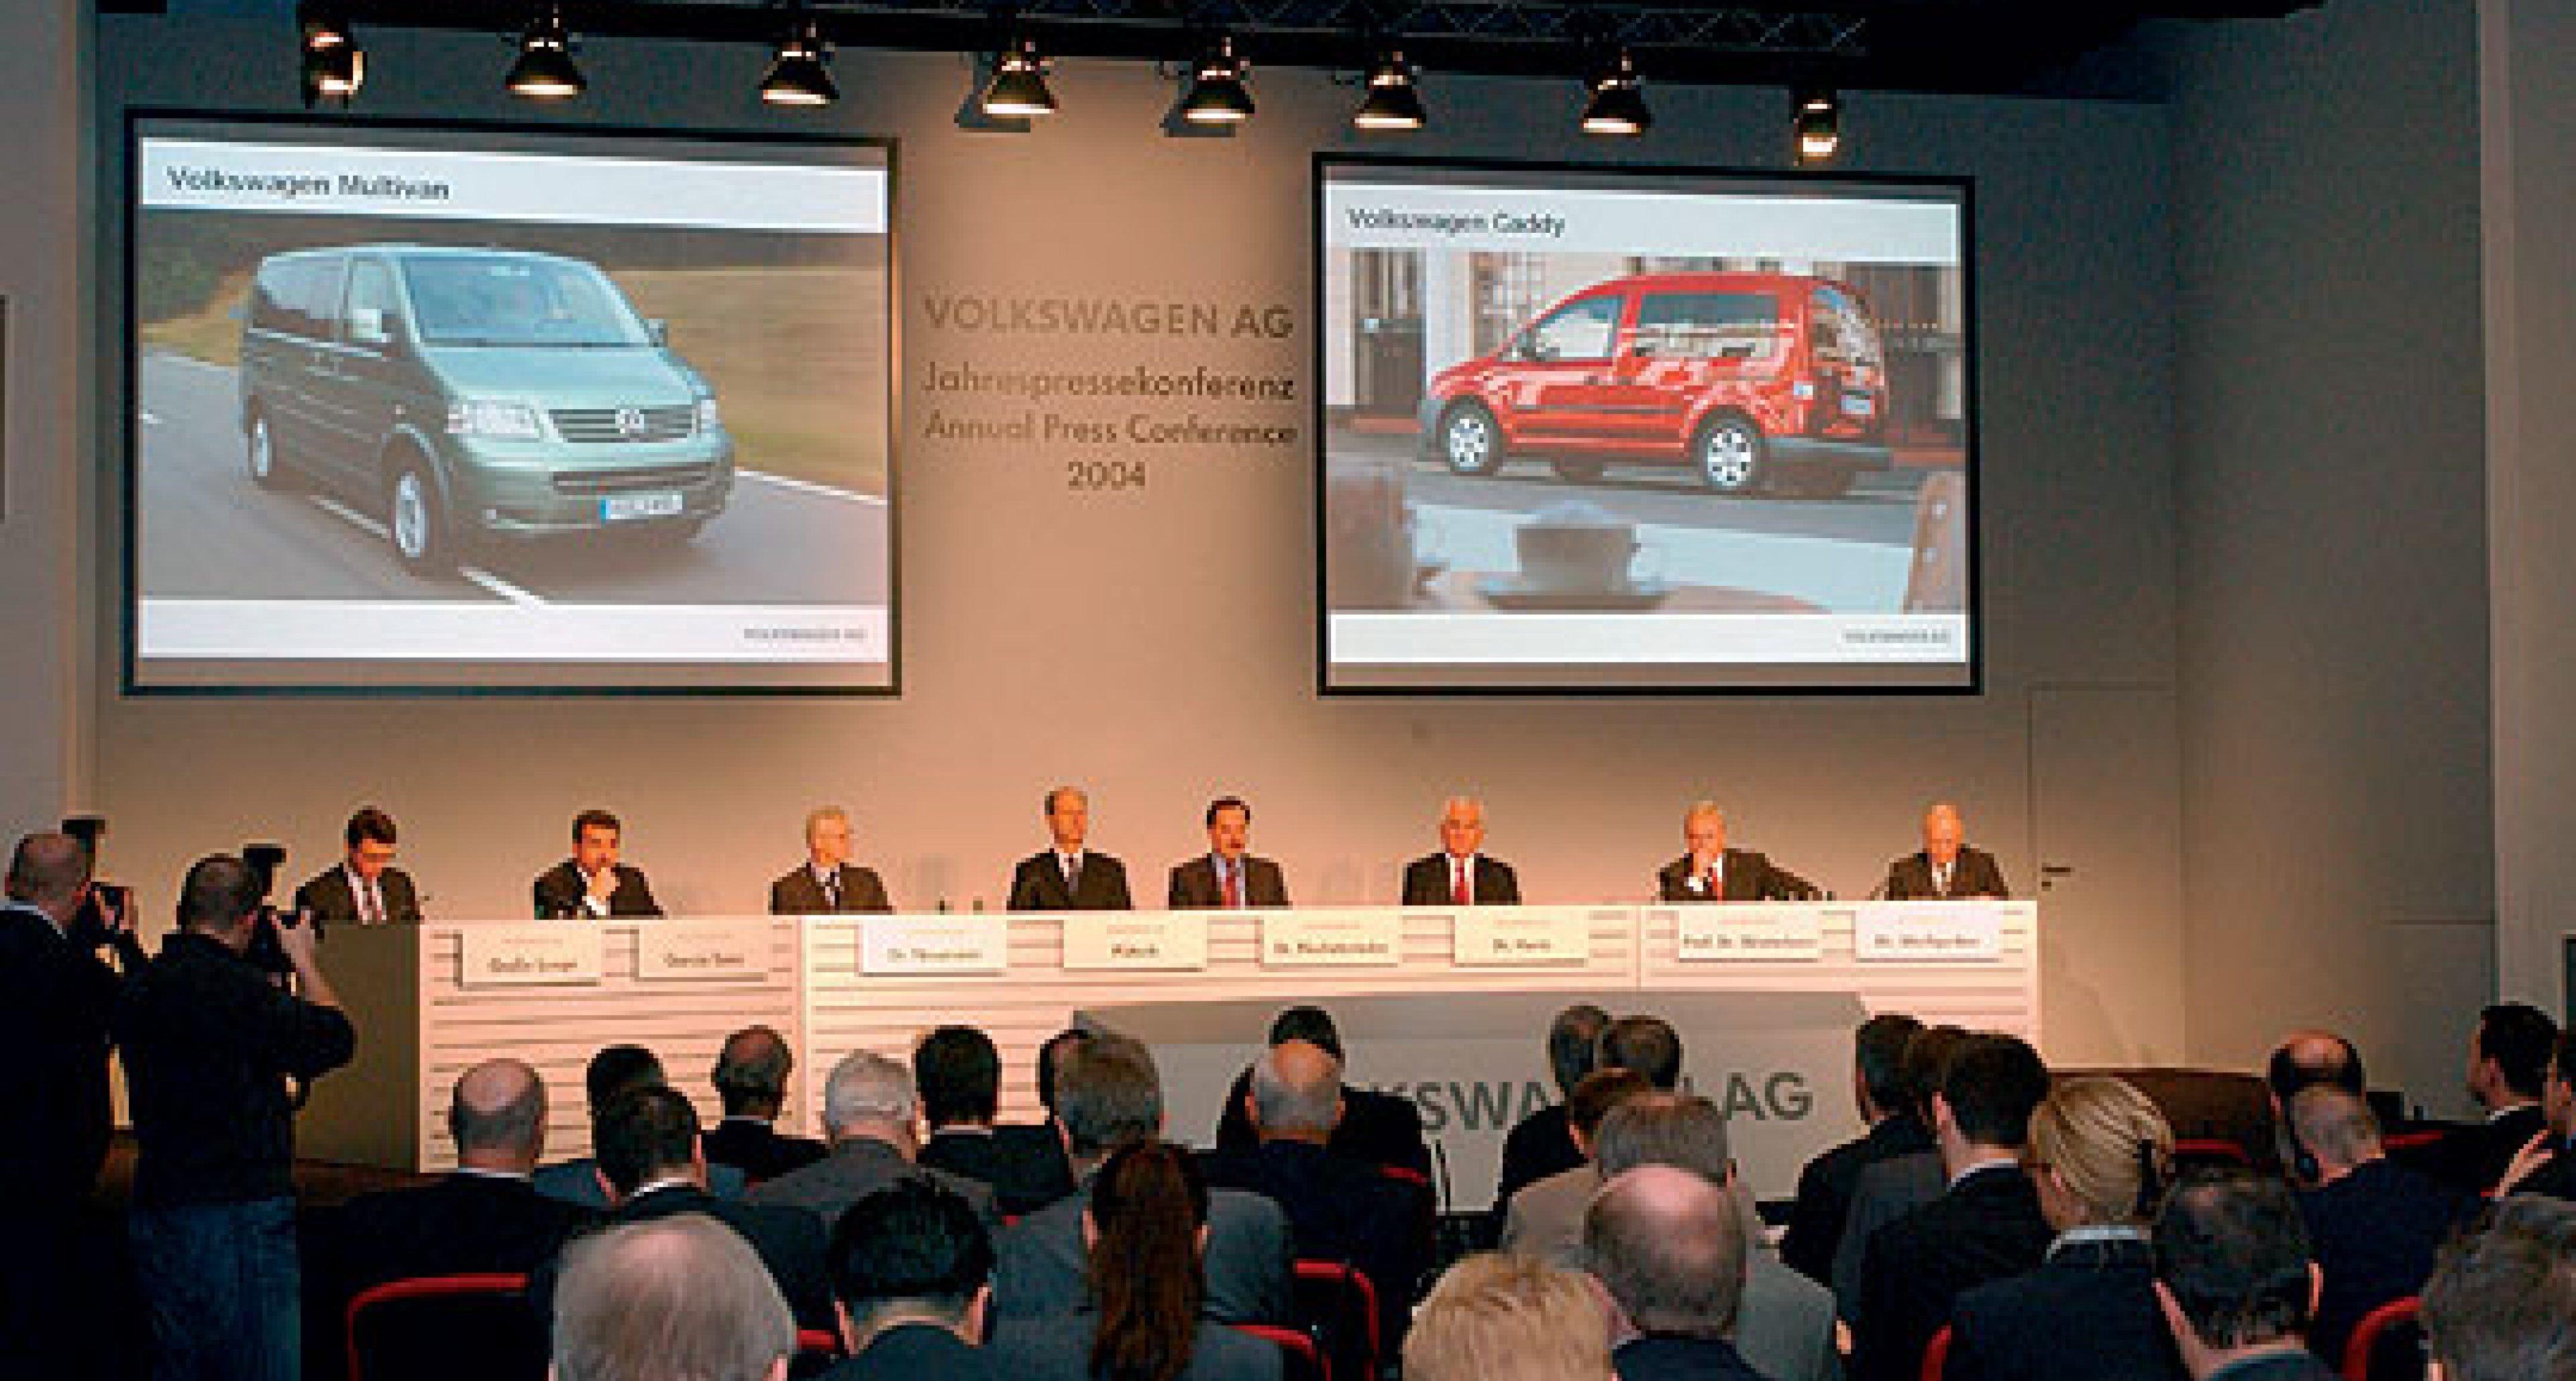 Volkswagen Jahrespressekonferenz 2004